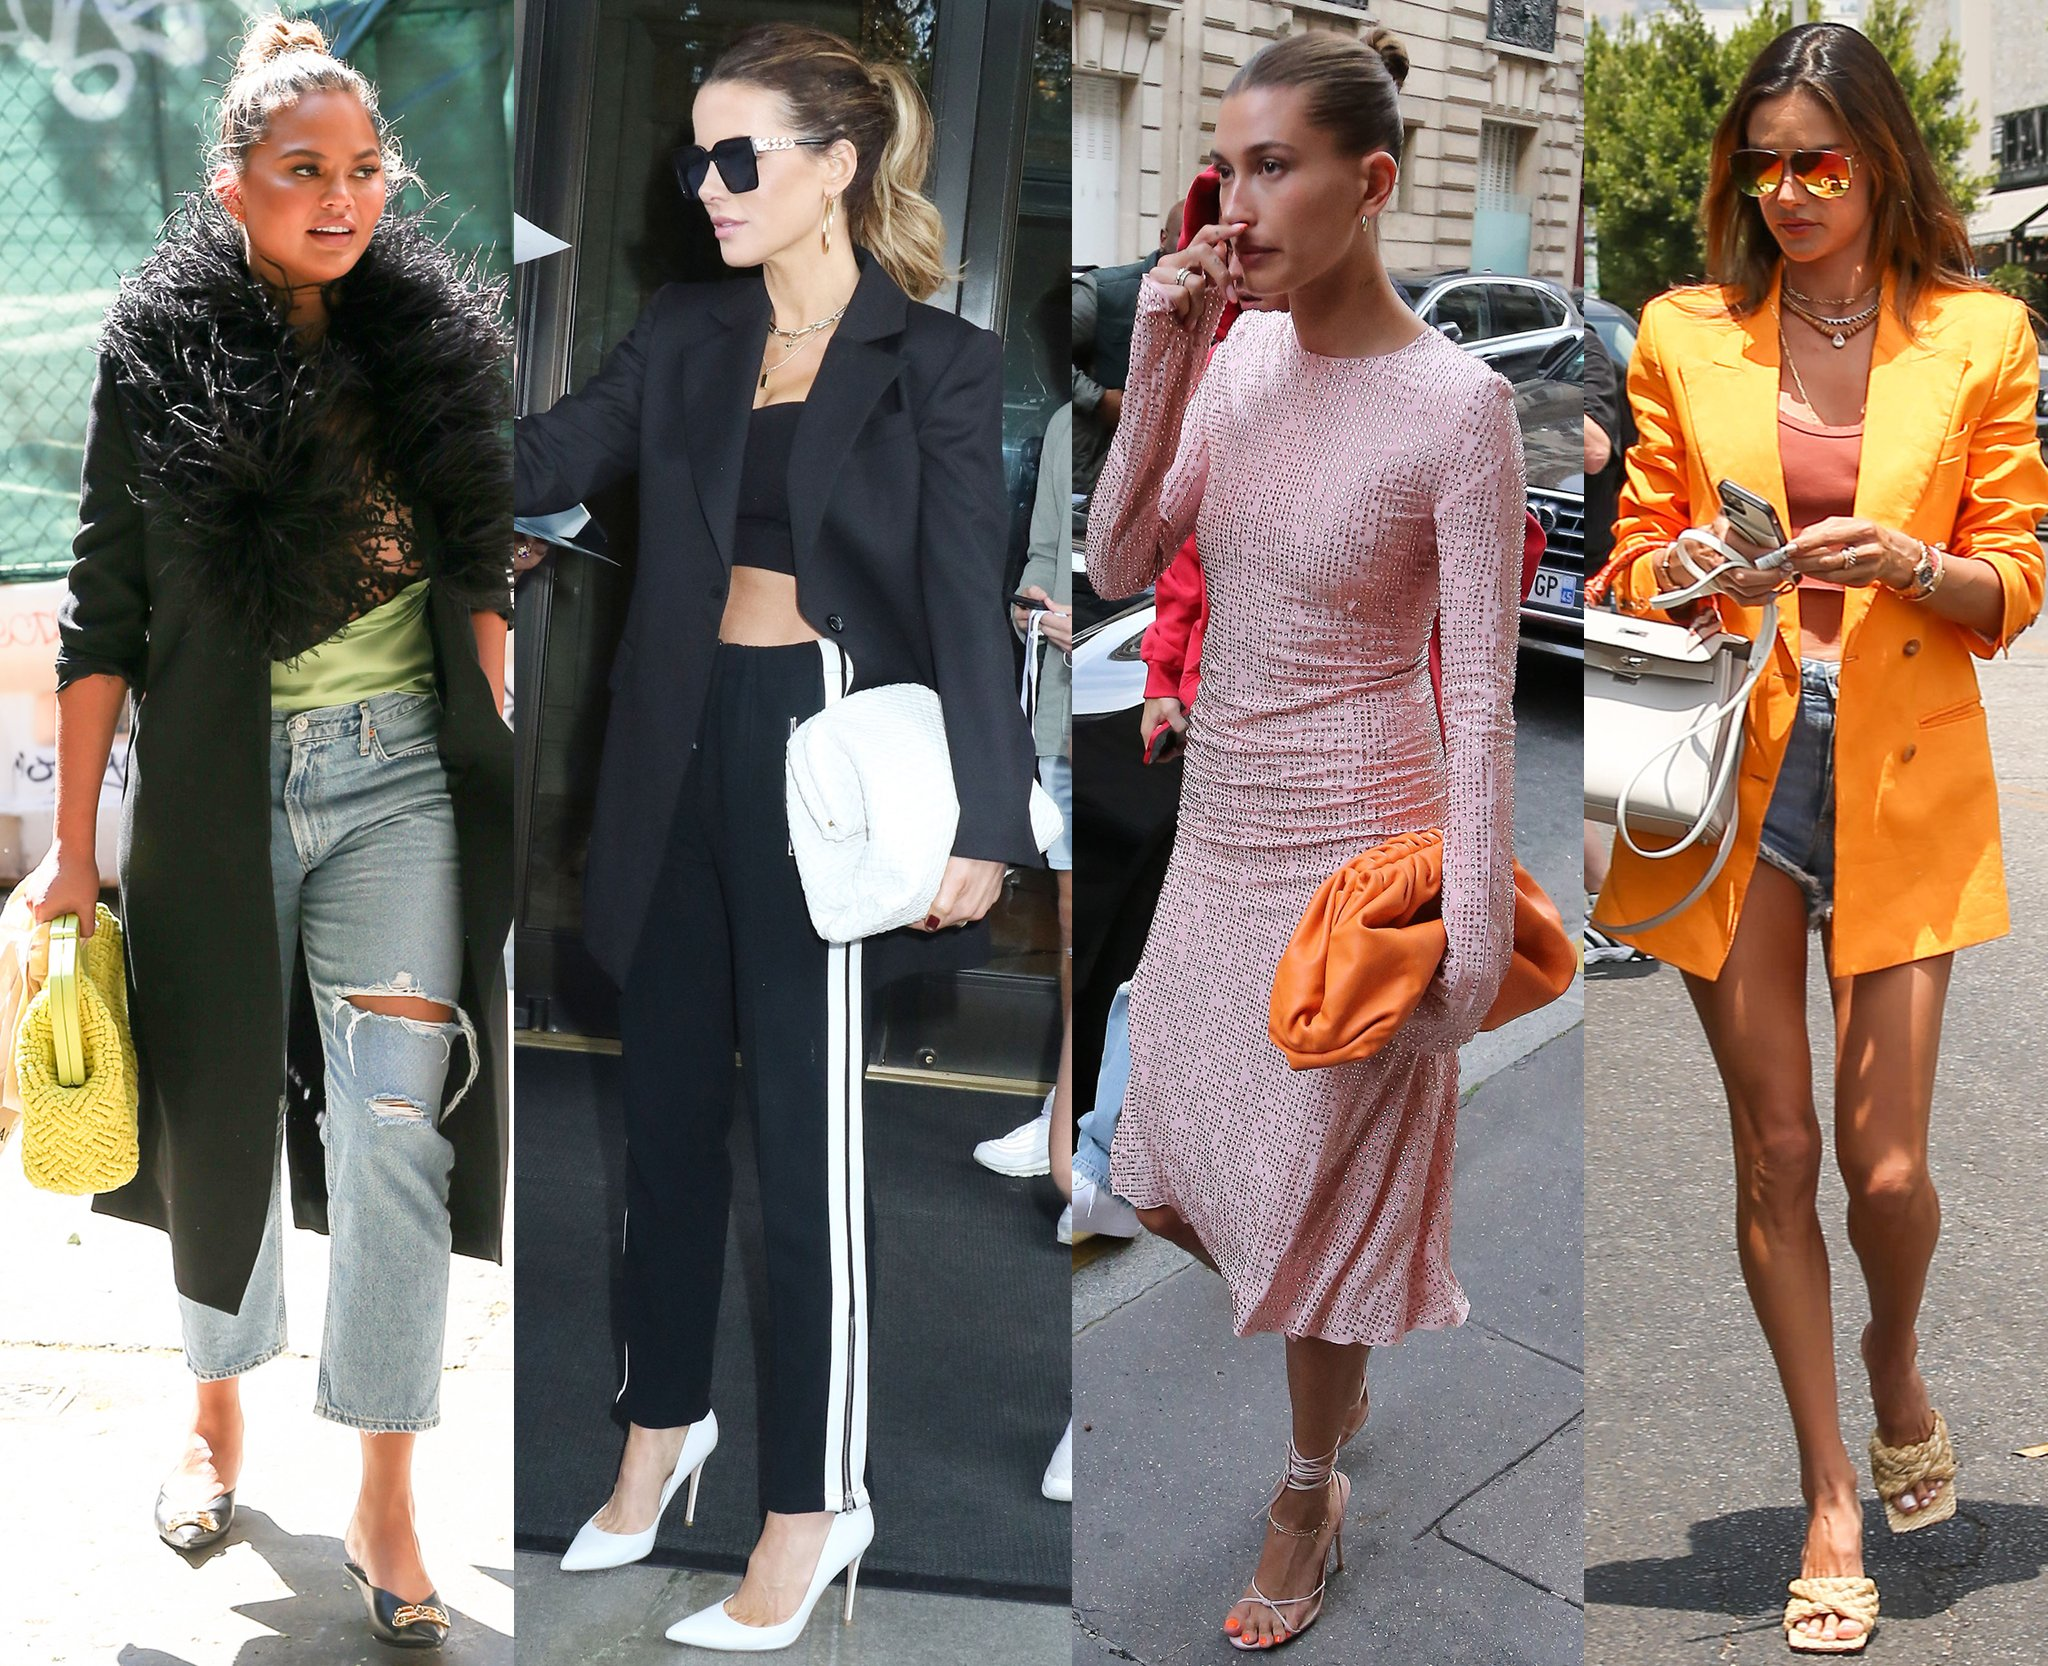 Chrissy Teigen, Kate Beckinsale, and Hailey Bieber carry the Bottega Veneta The Pouch clutch, while Alessandra Ambrosio slips into a pair of Bottega Veneta Raffia sandals